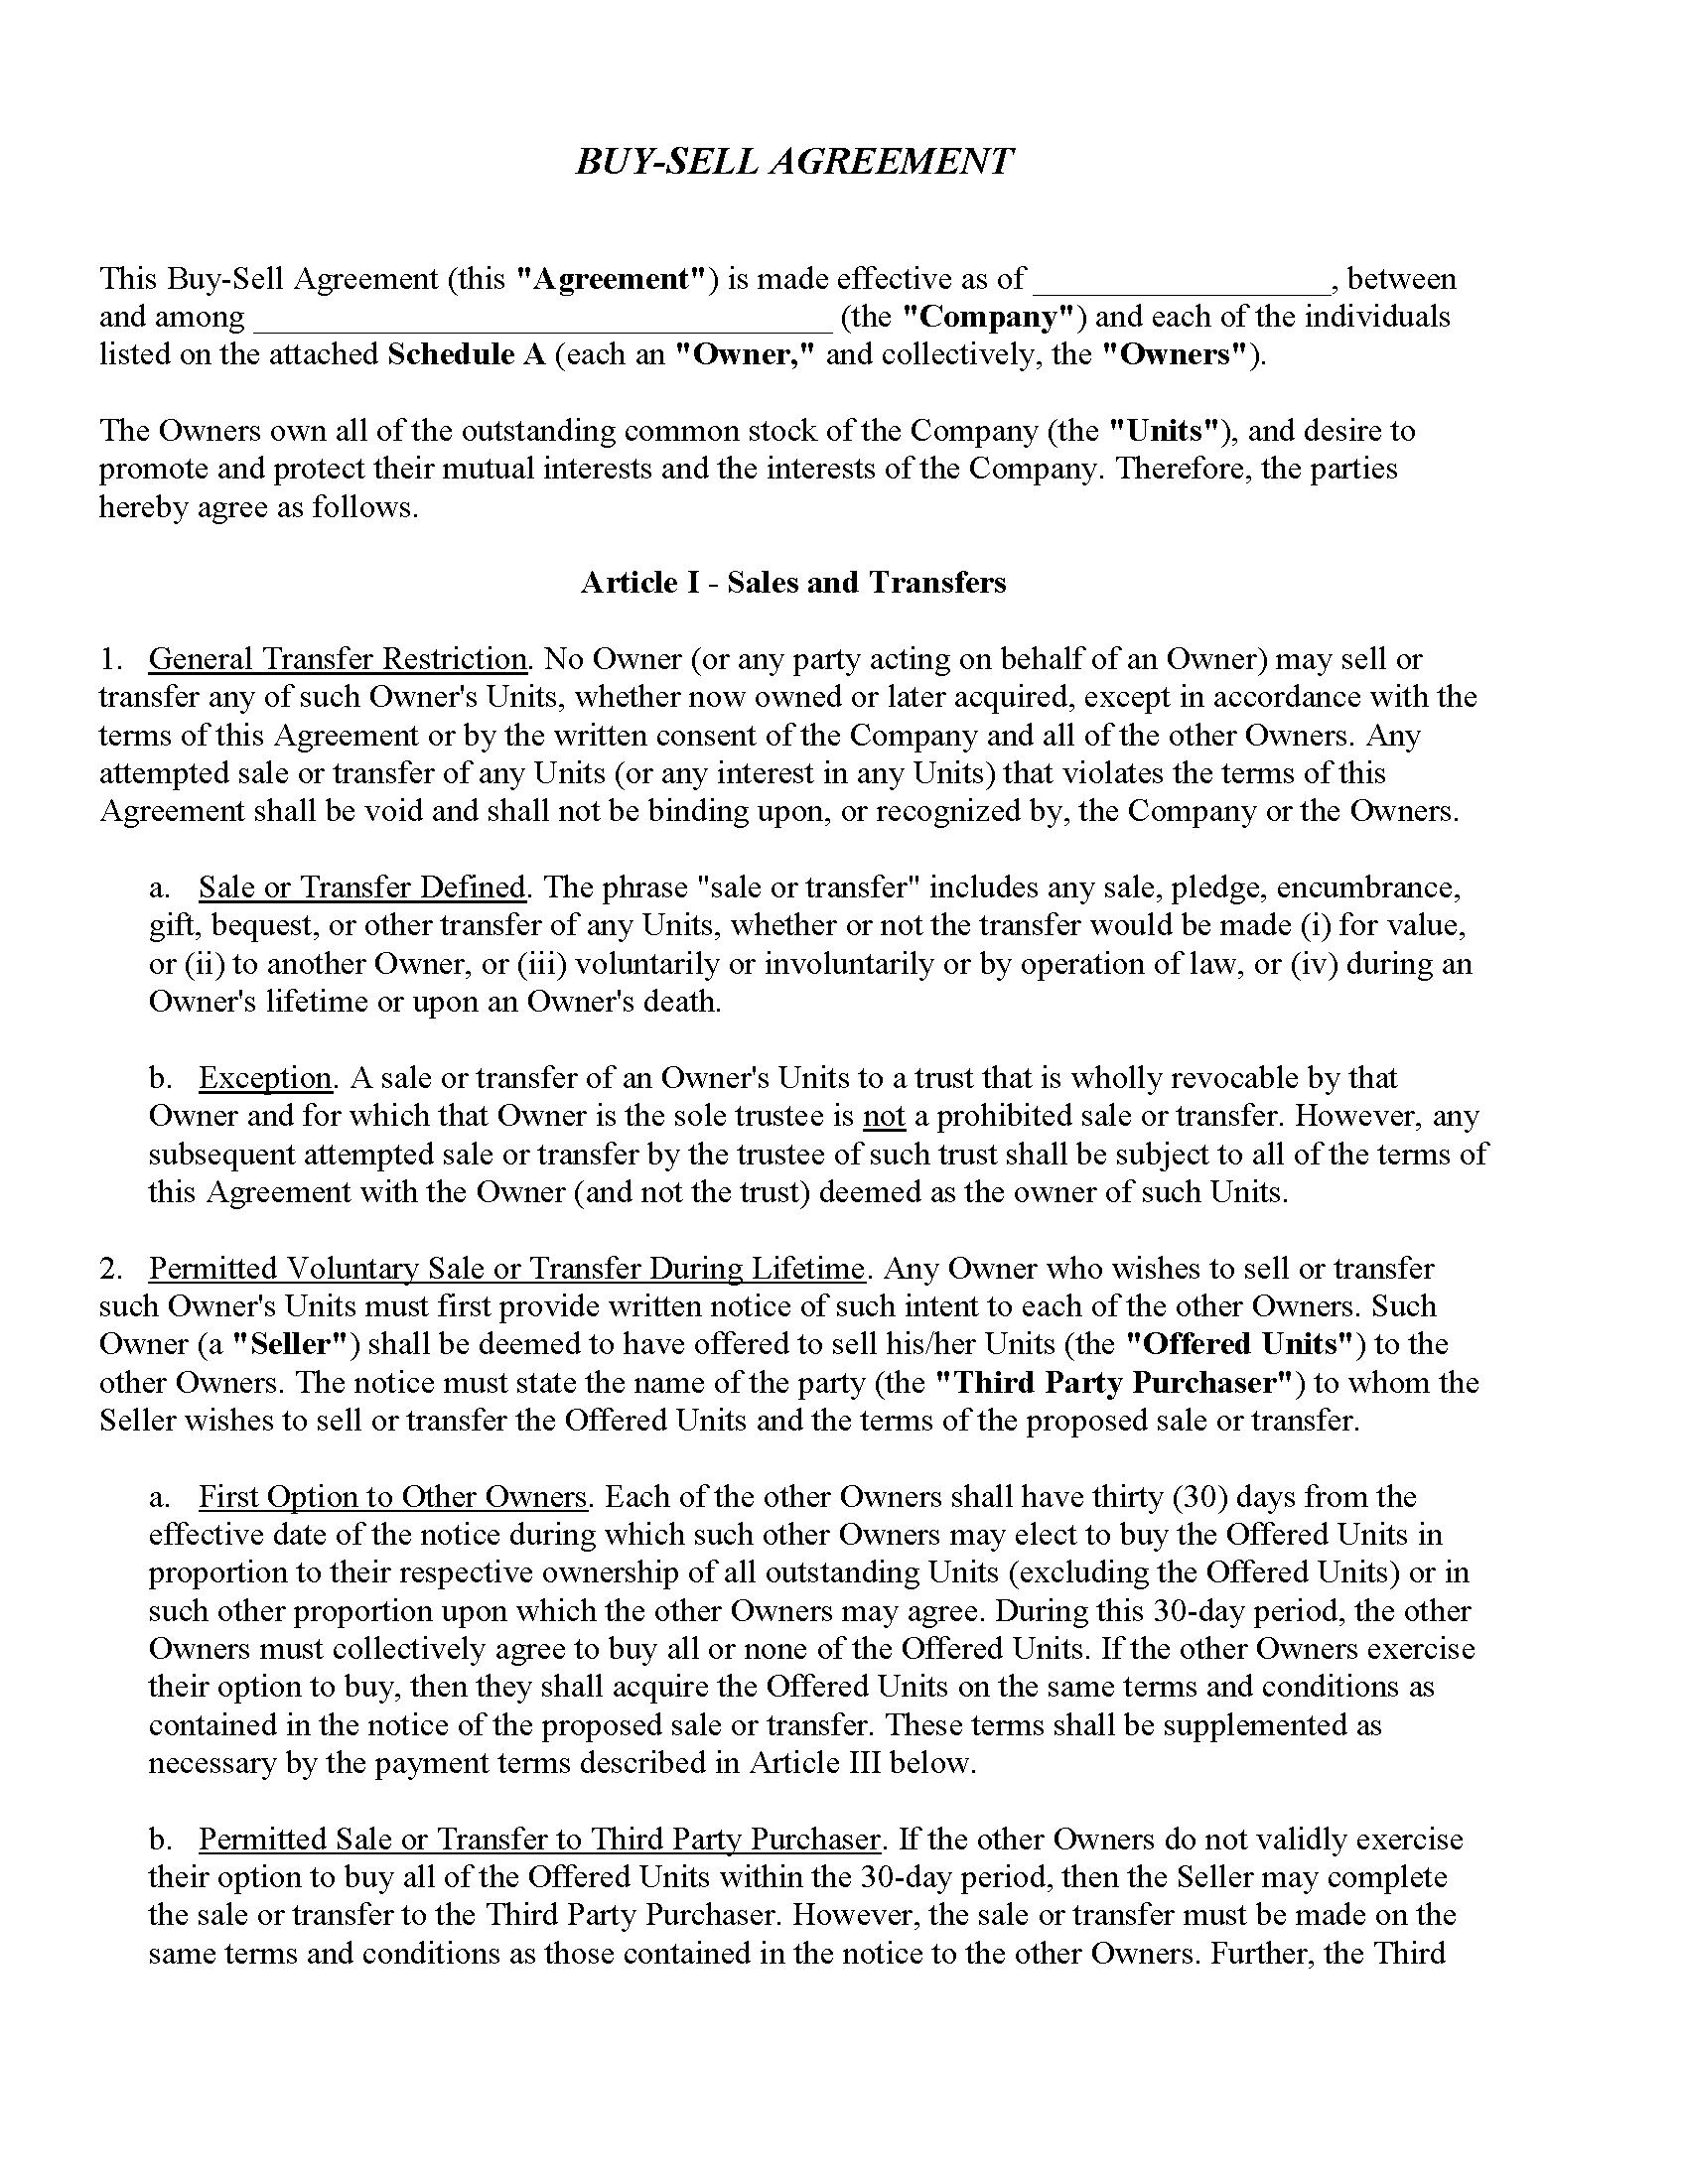 Idaho Buy-Sell Agreement